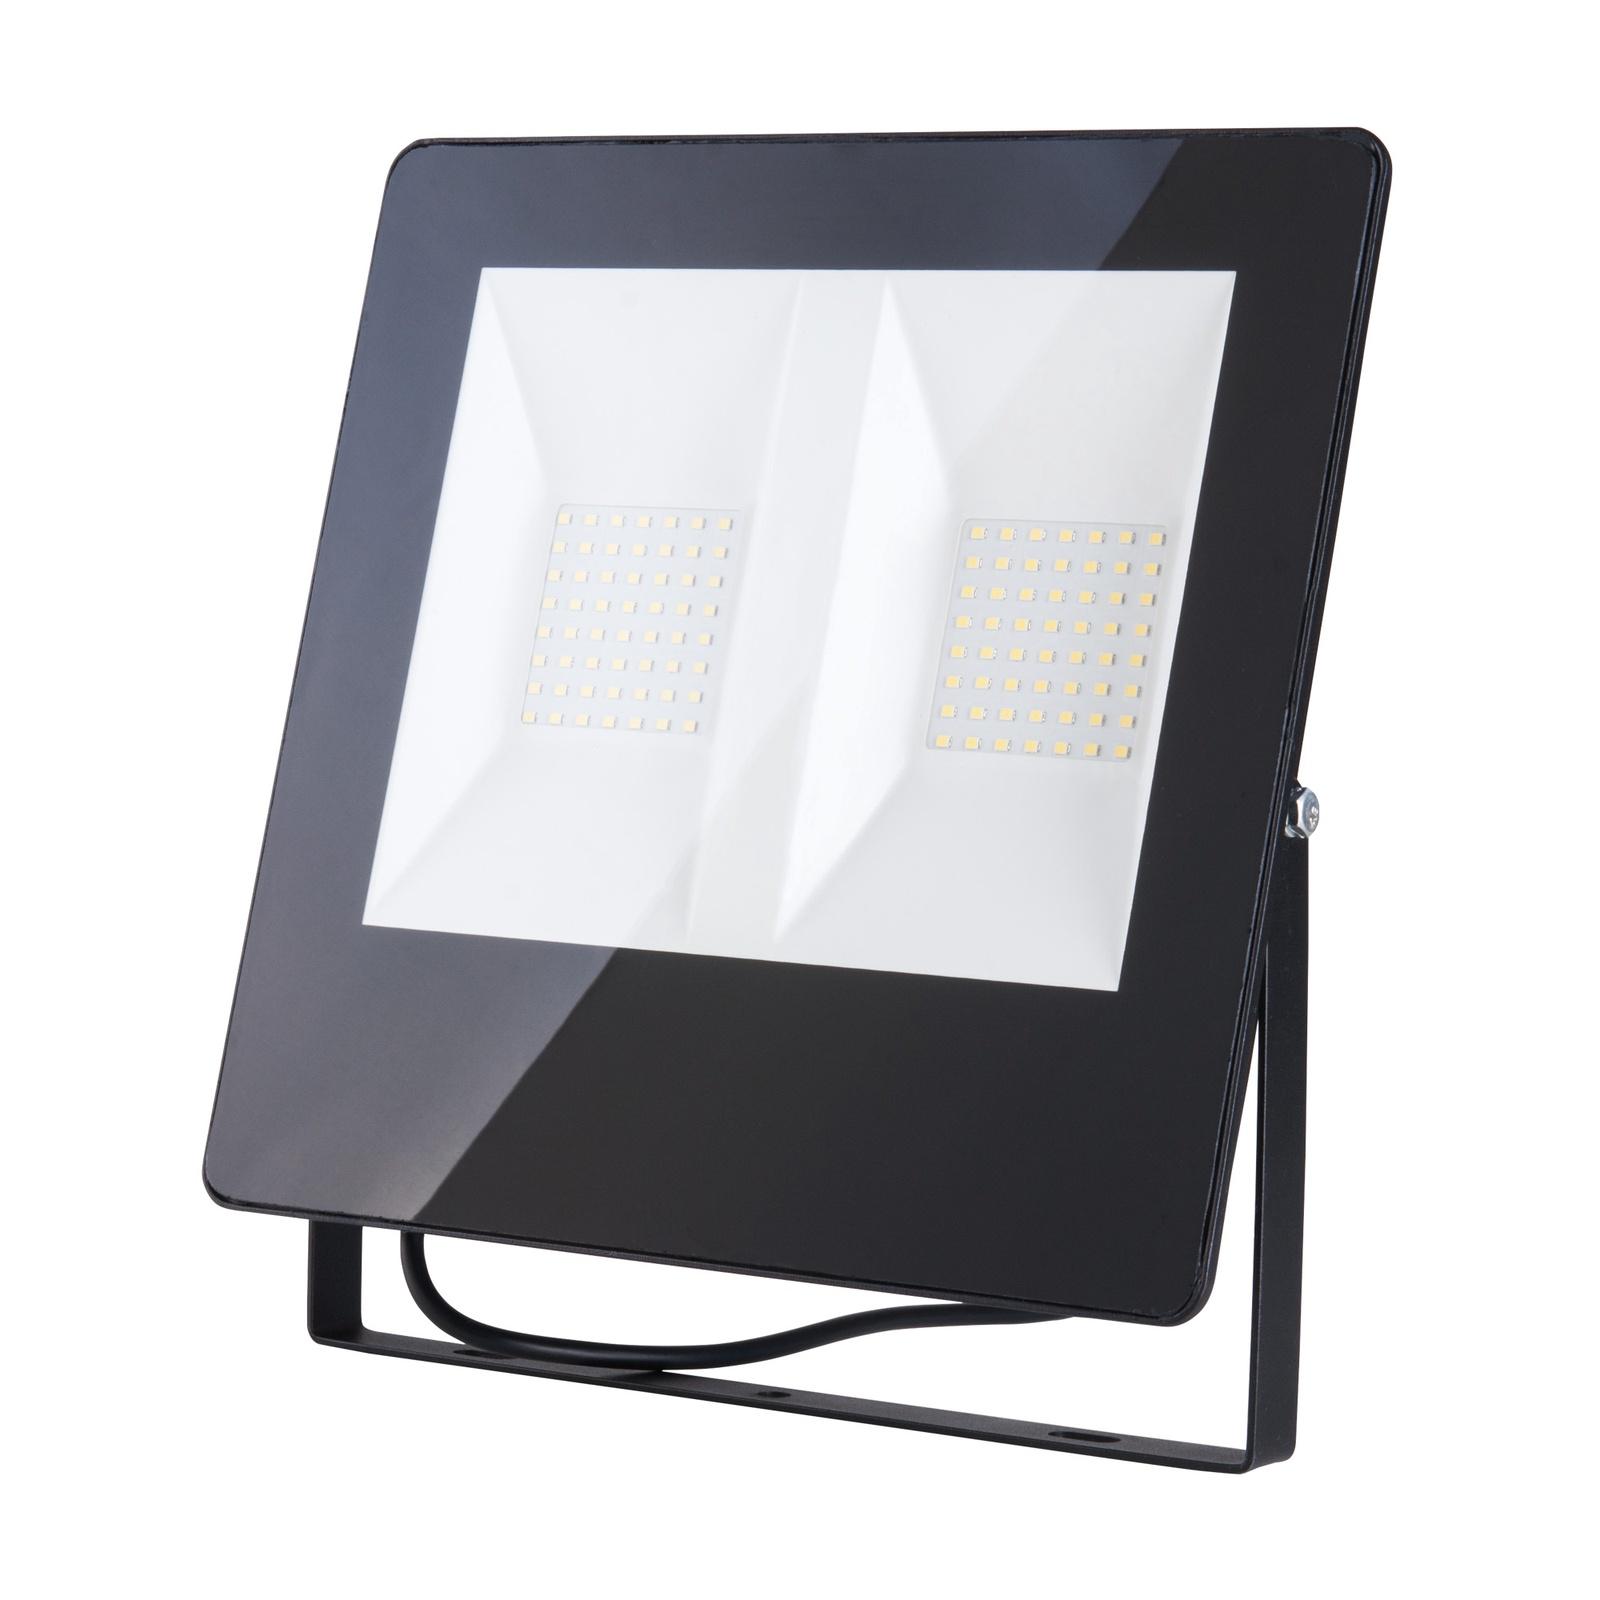 купить Прожектор Elektrostandard светодиодный 011 FL LED 100W 6500K IP65, 6500, 100 Вт онлайн